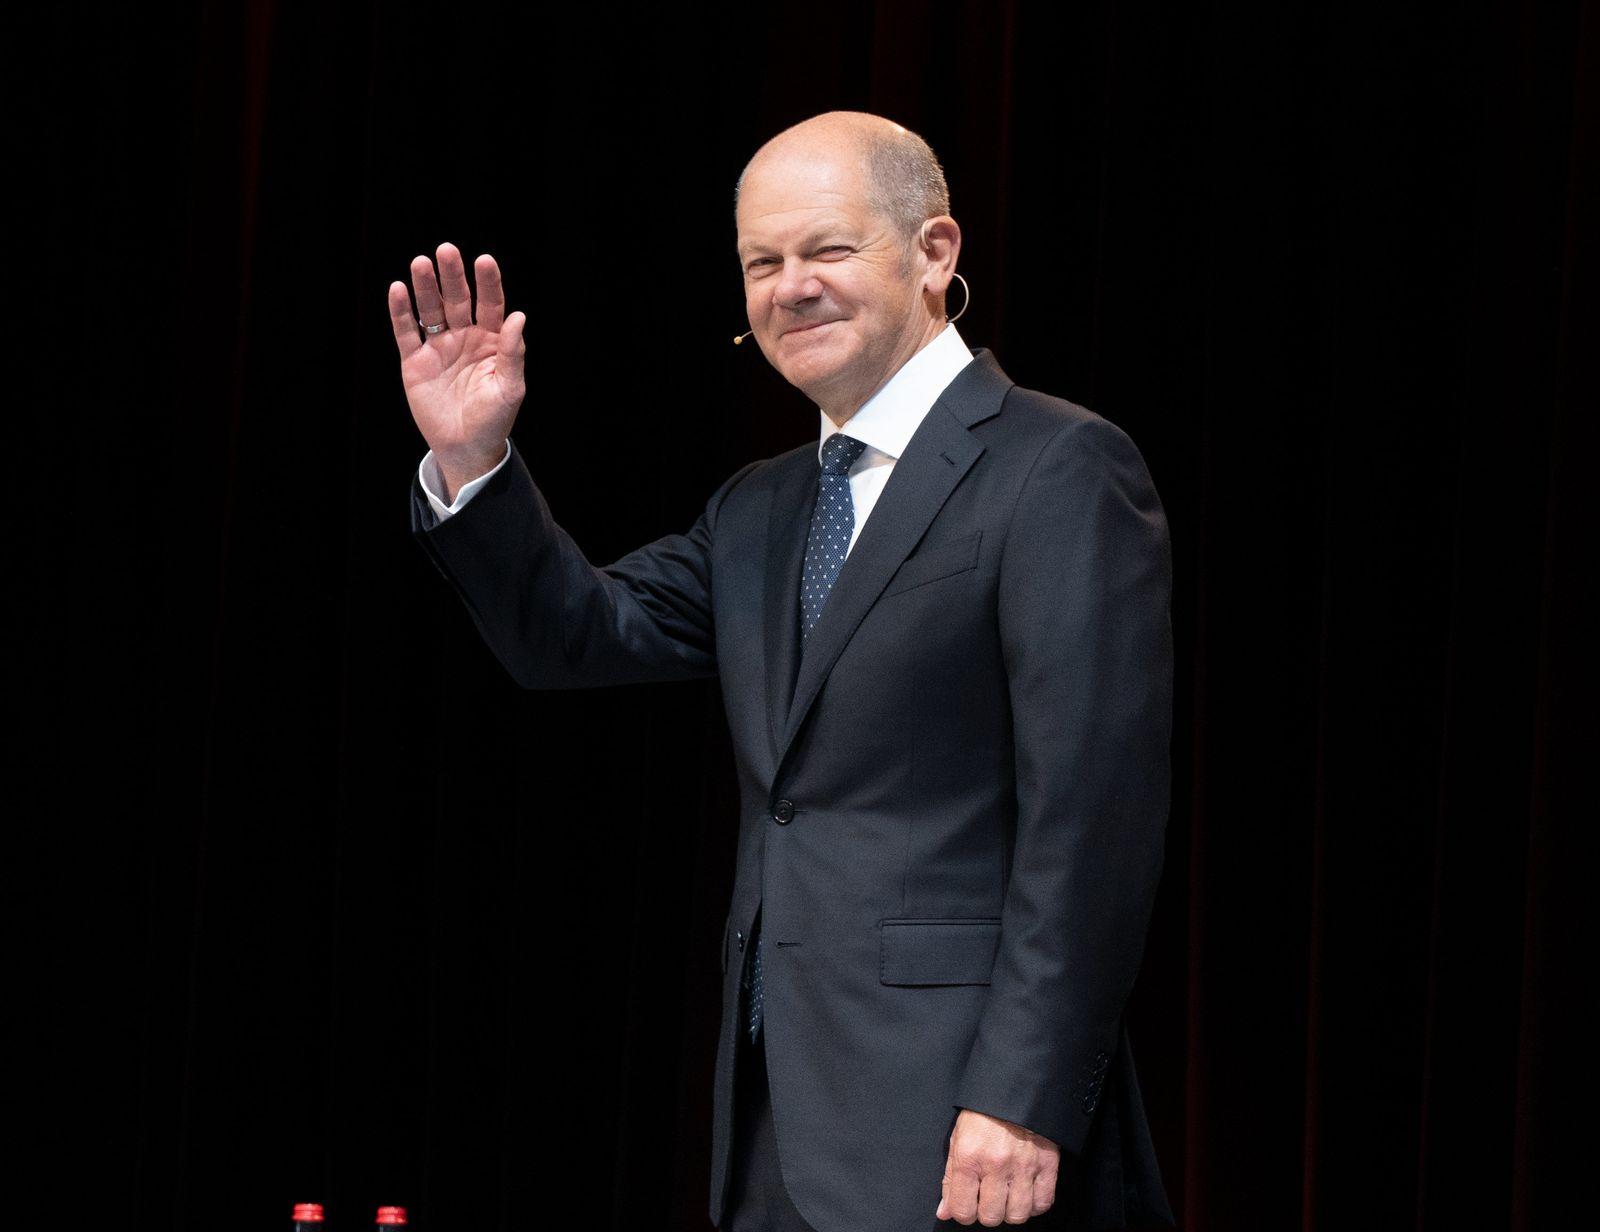 Wahlkampf SPD - Olaf Scholz in Heilbronn